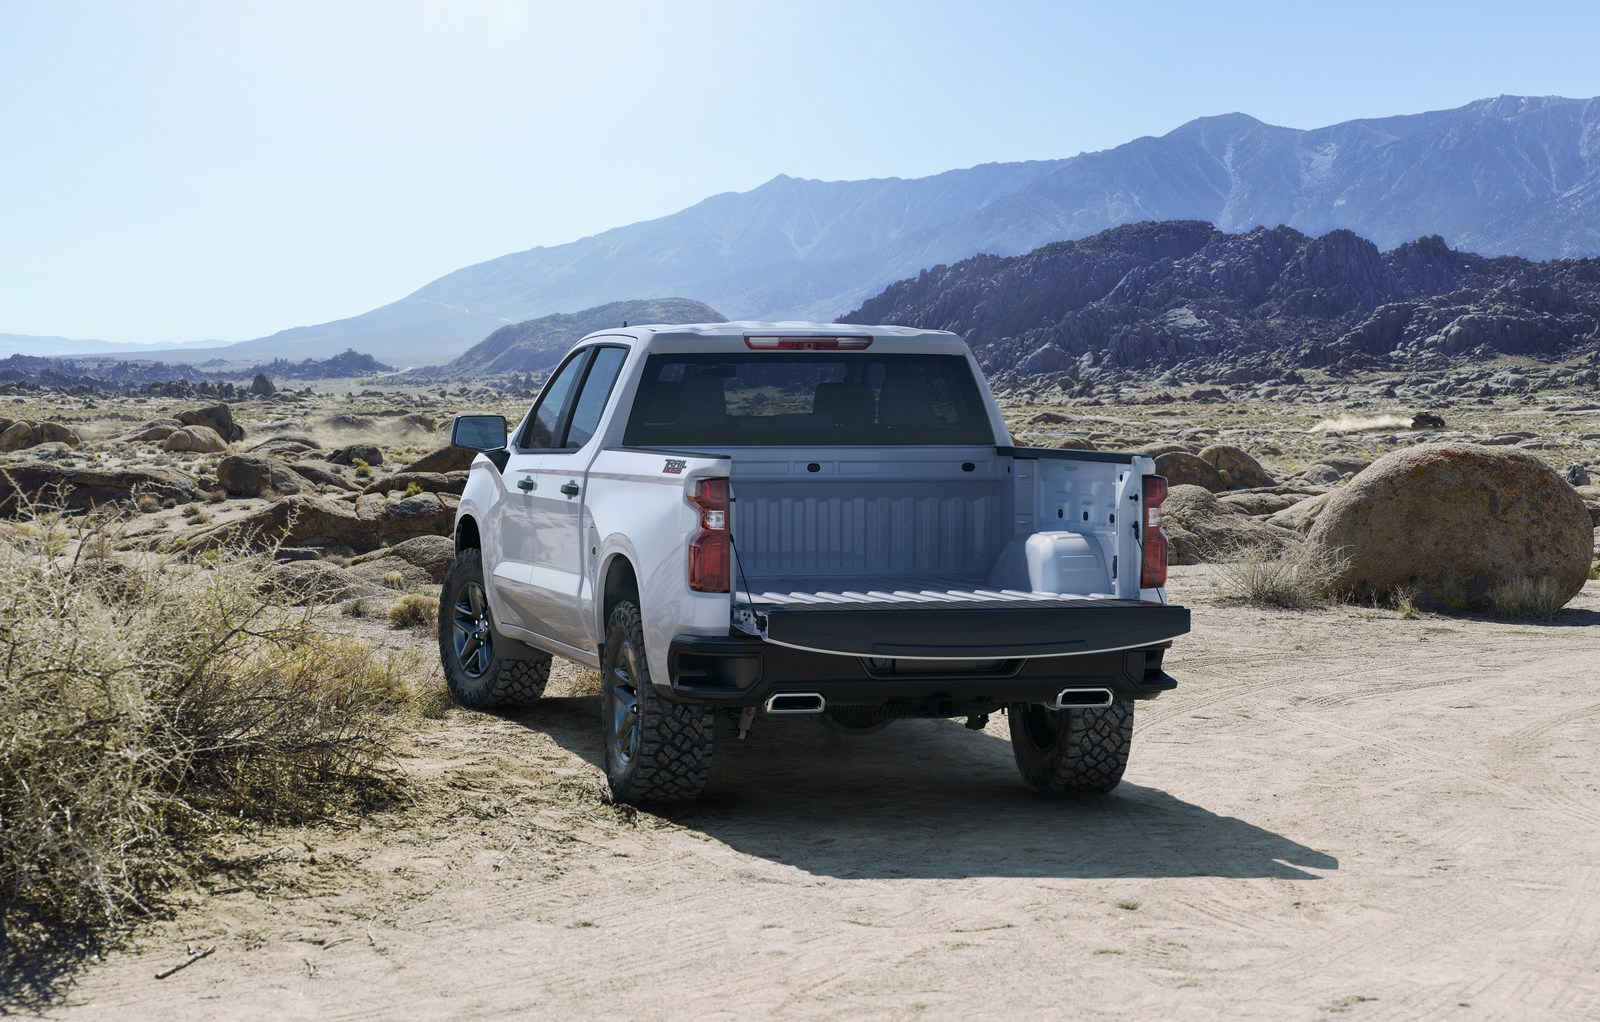 2019 Chevrolet Silverado Engine Range Includes 3.0-liter ...